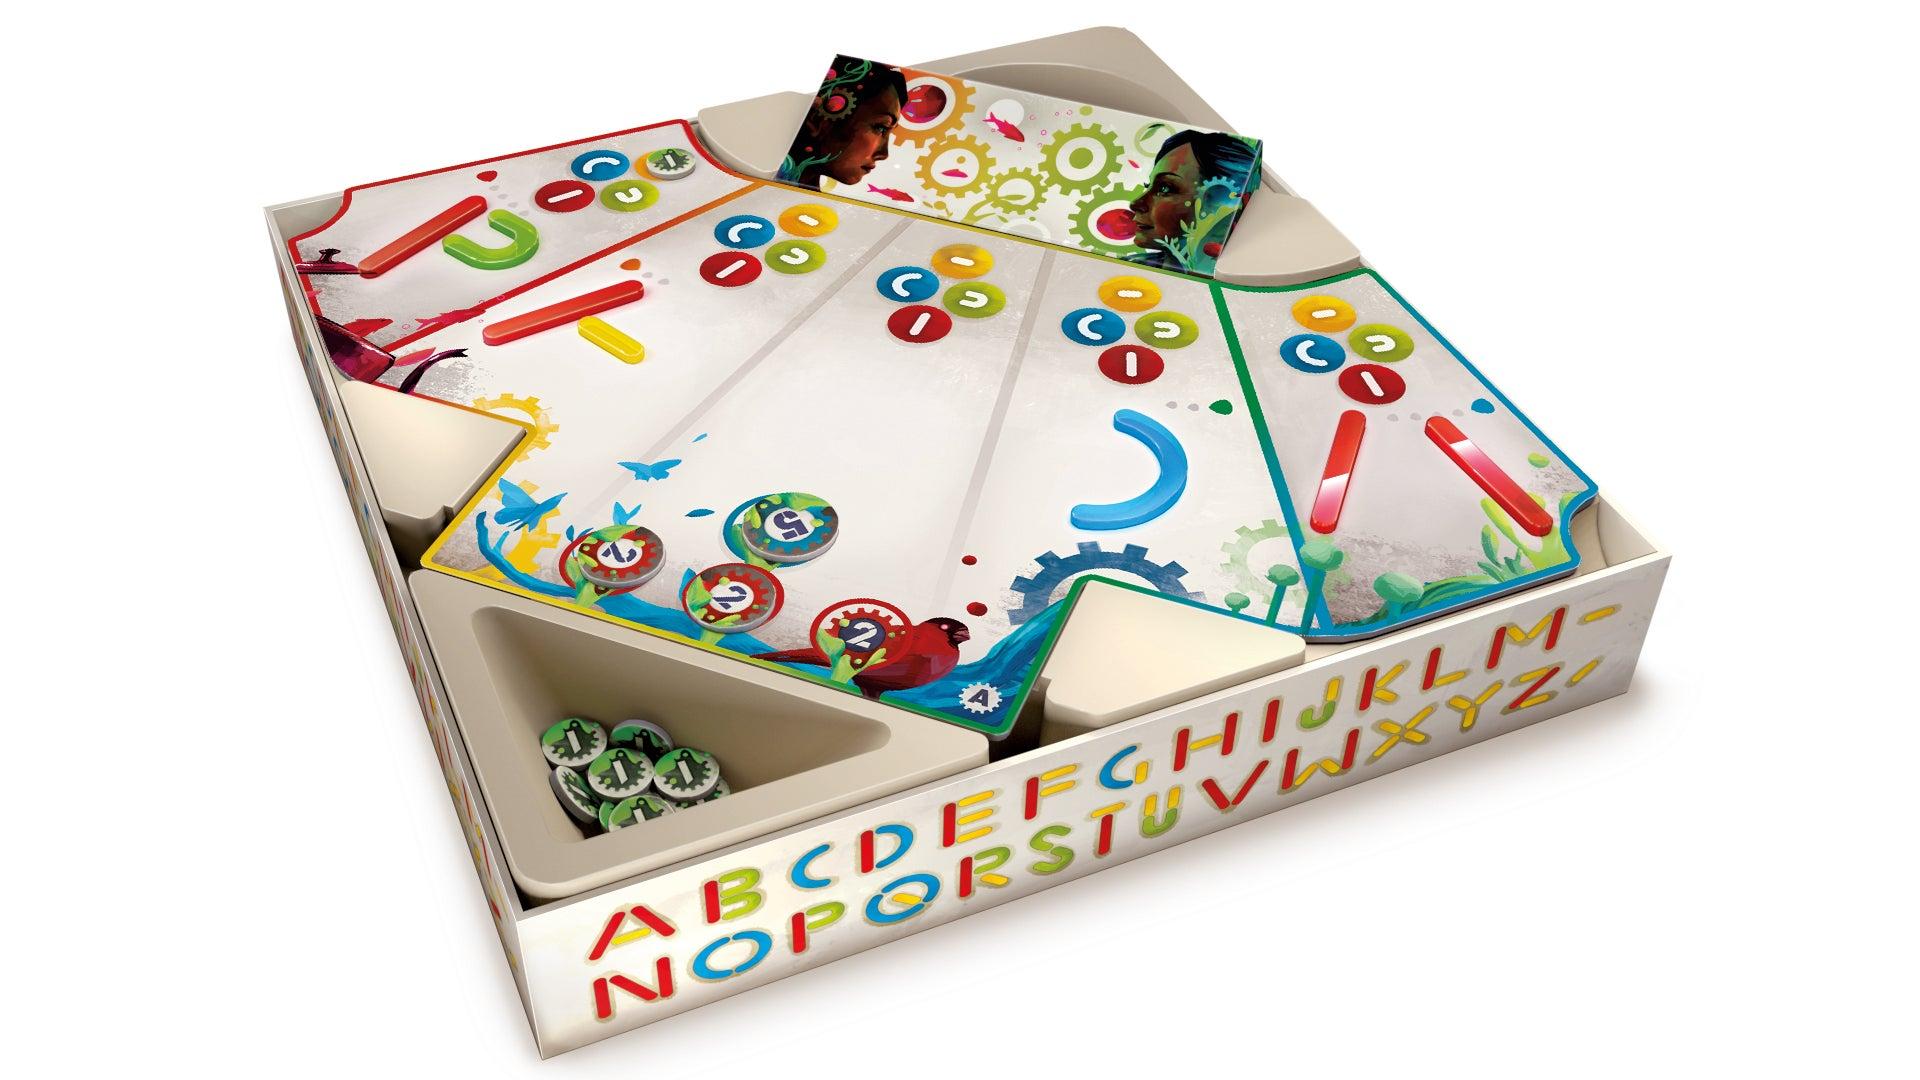 decipher-board-game-gameplay-layout.jpg